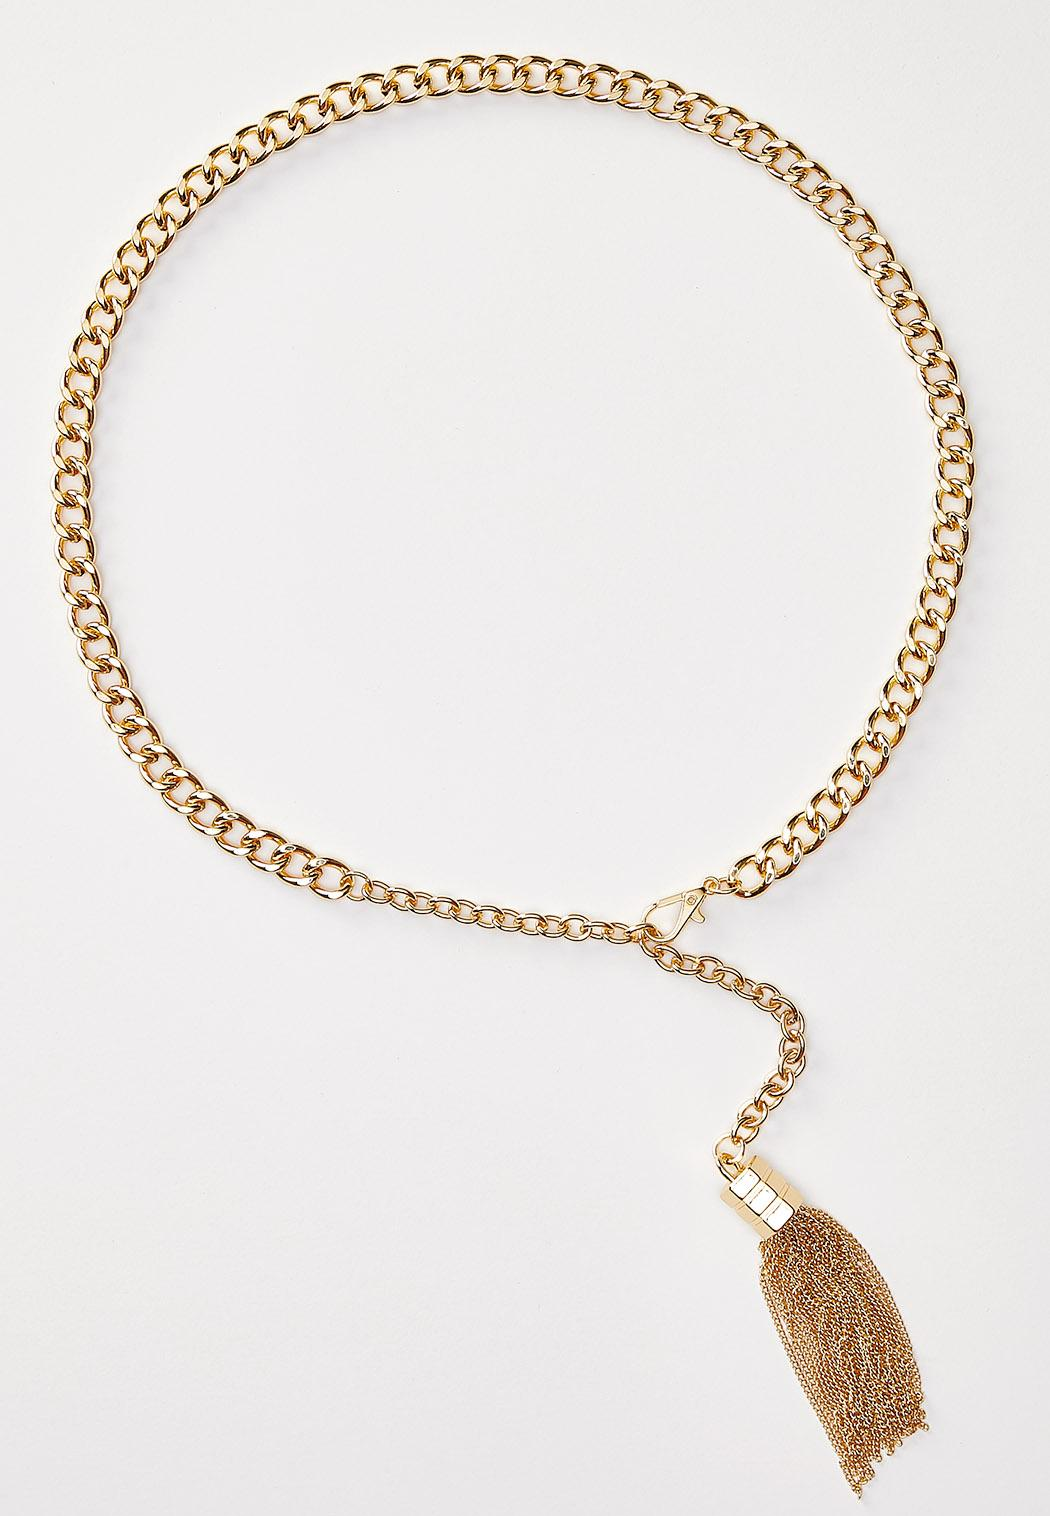 Plus Size Gold Tasseled Chain Belt